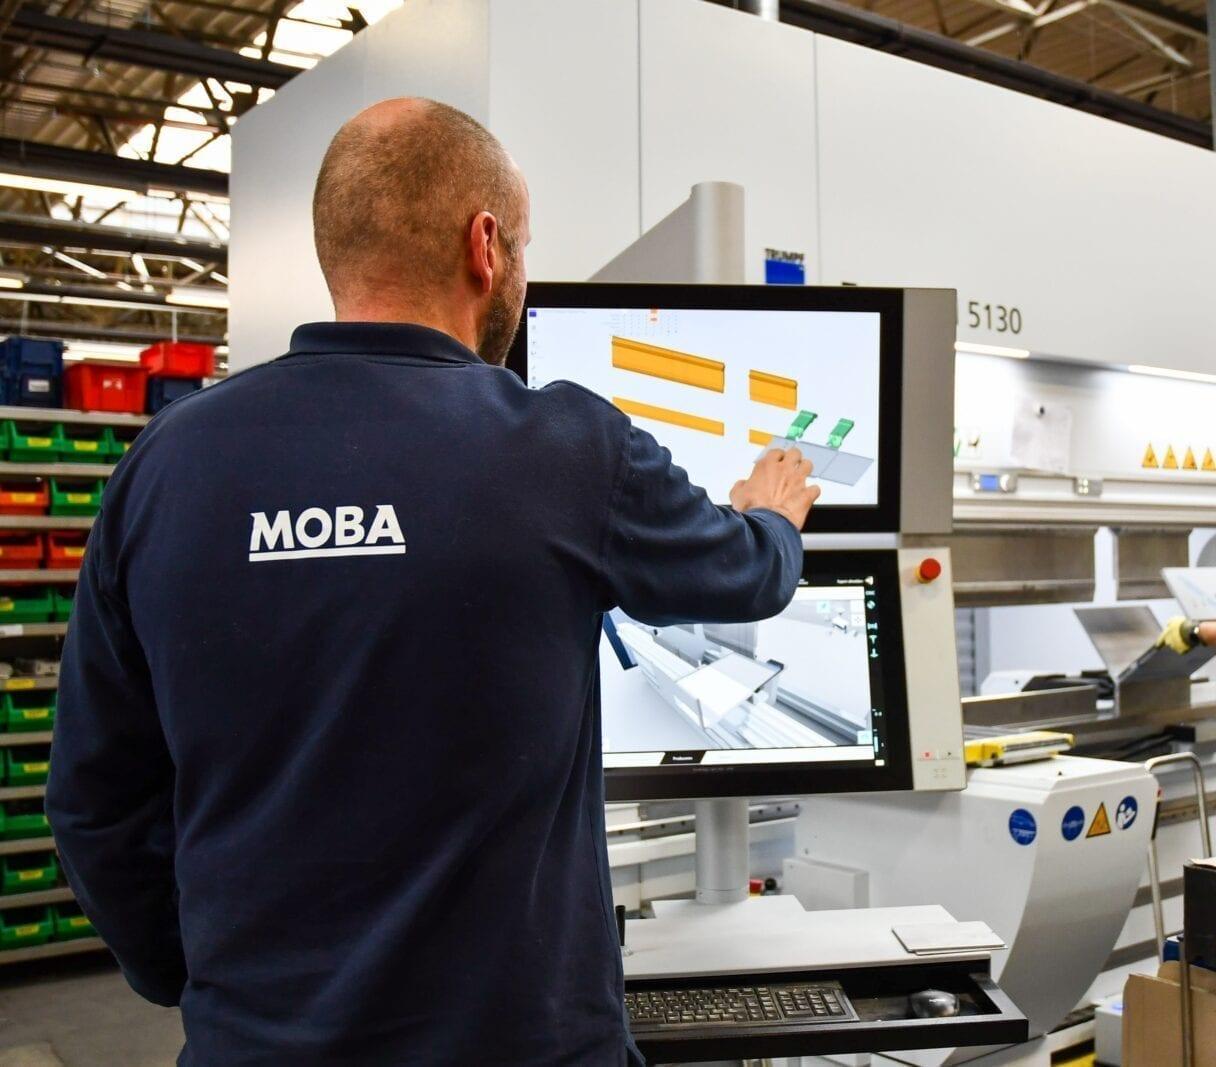 Ga werken bij Moba in Barneveld